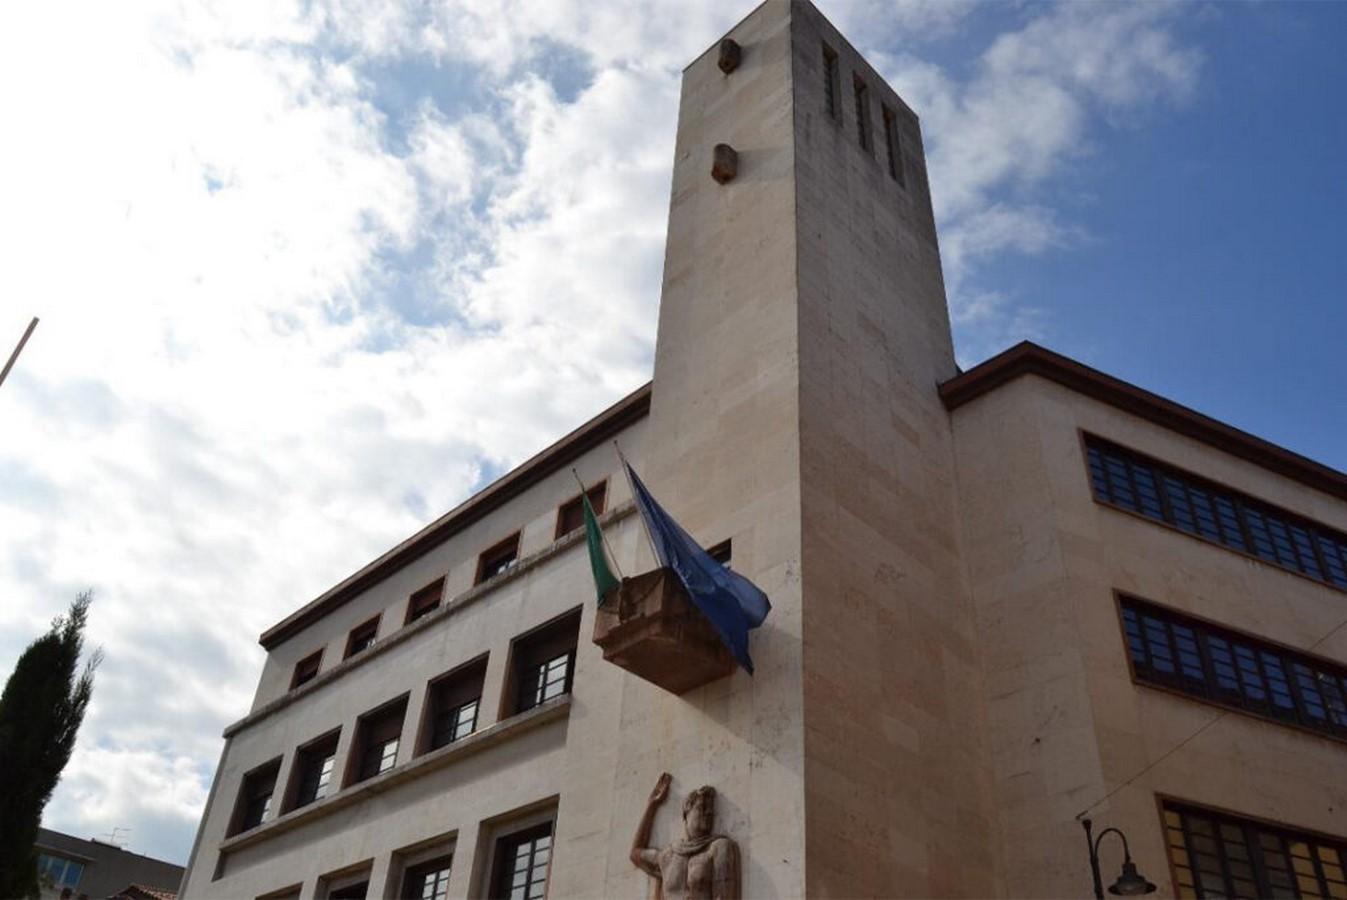 Architects in Prato - Top 20 Architects in Prato - Sheet9